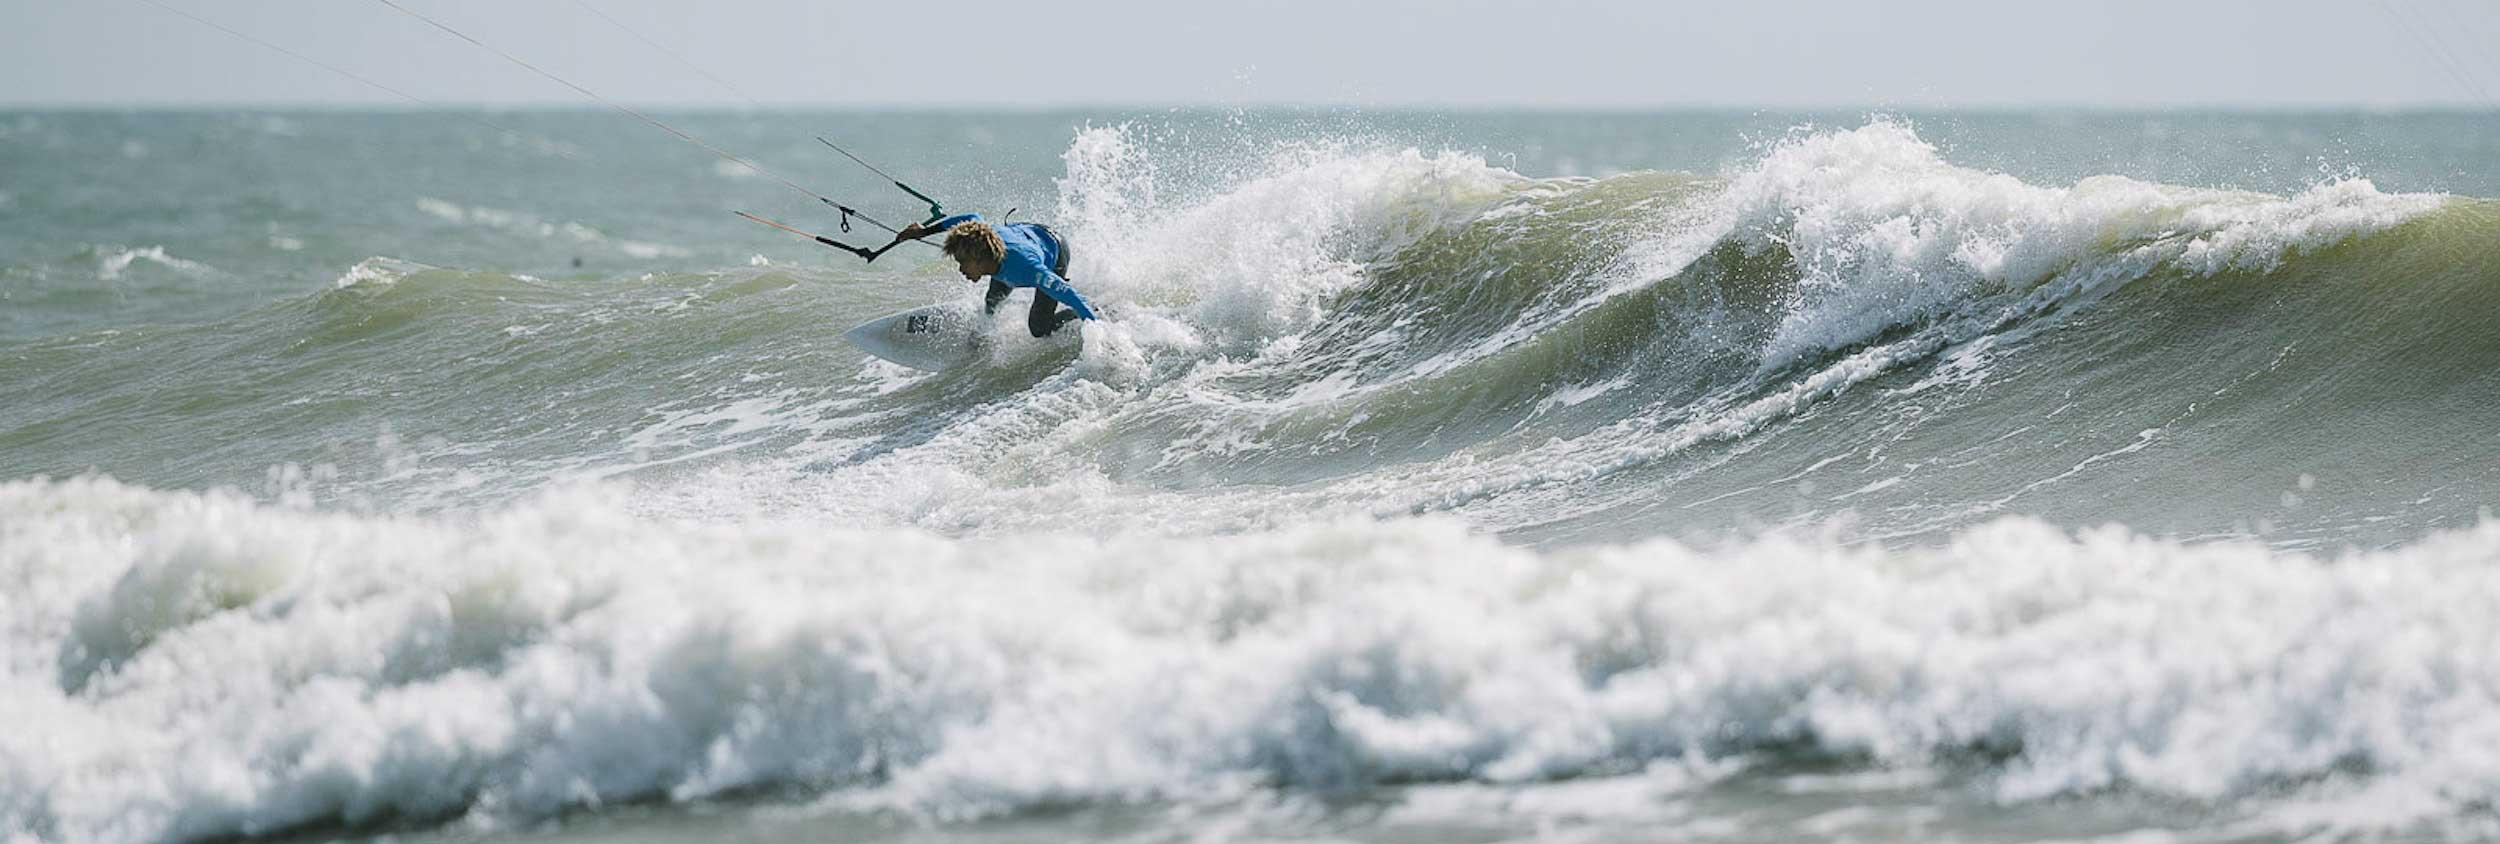 GKA Kite-Surf World Tour Dakhla 2018 Finals - Jan Marcos Riveras